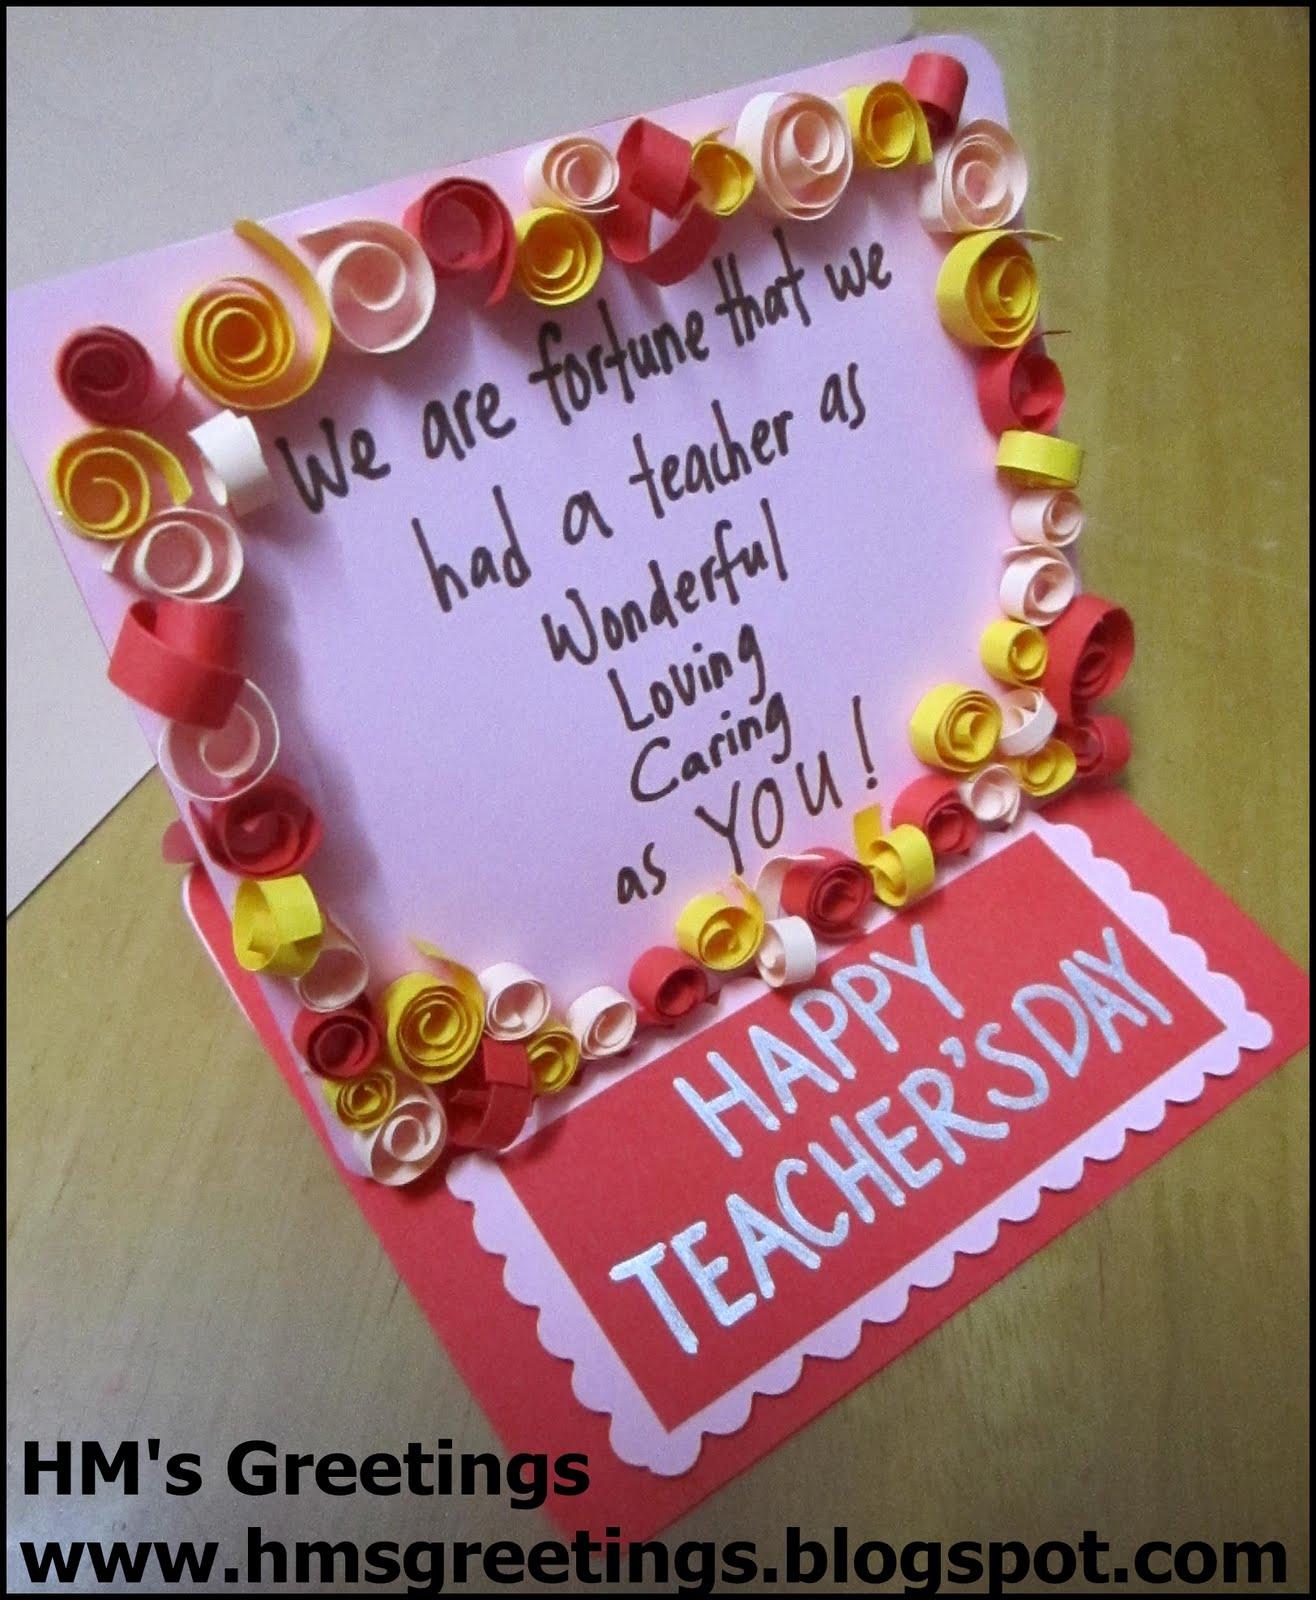 HM's Greetings: Teachers' Day Card #1